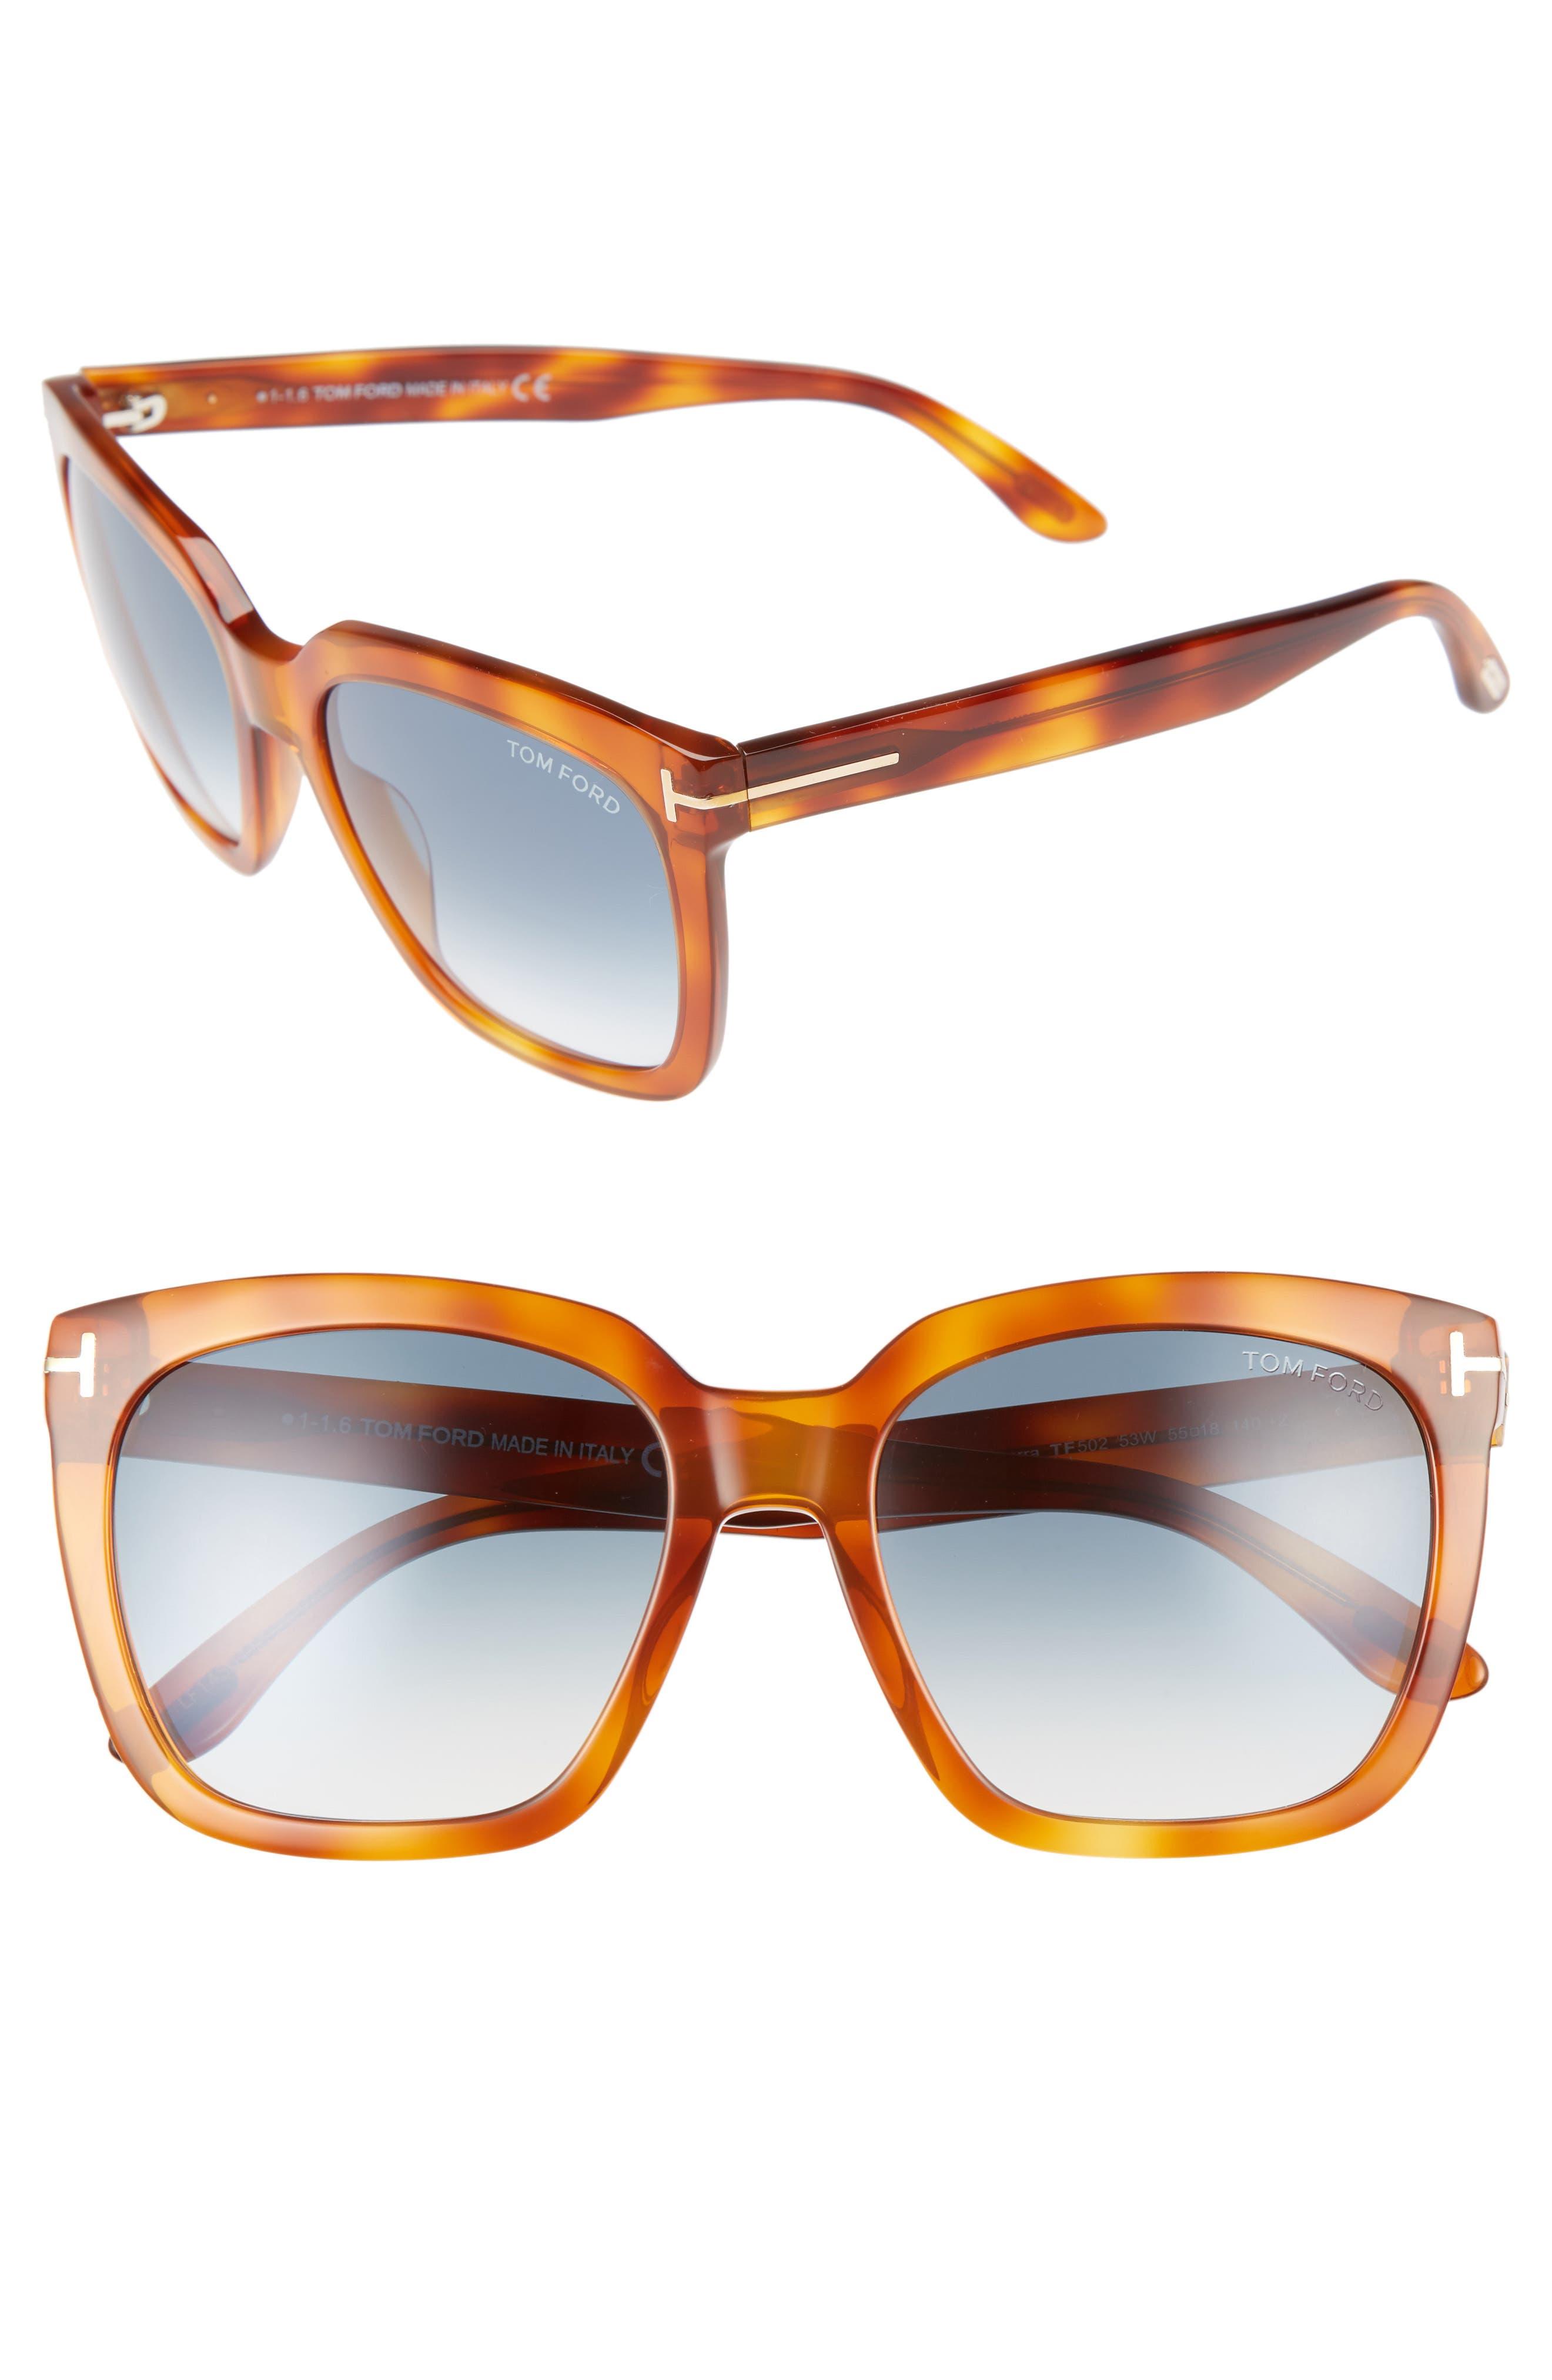 Main Image - Tom Ford Amarra 55mm Gradient Lens Square Sunglasses